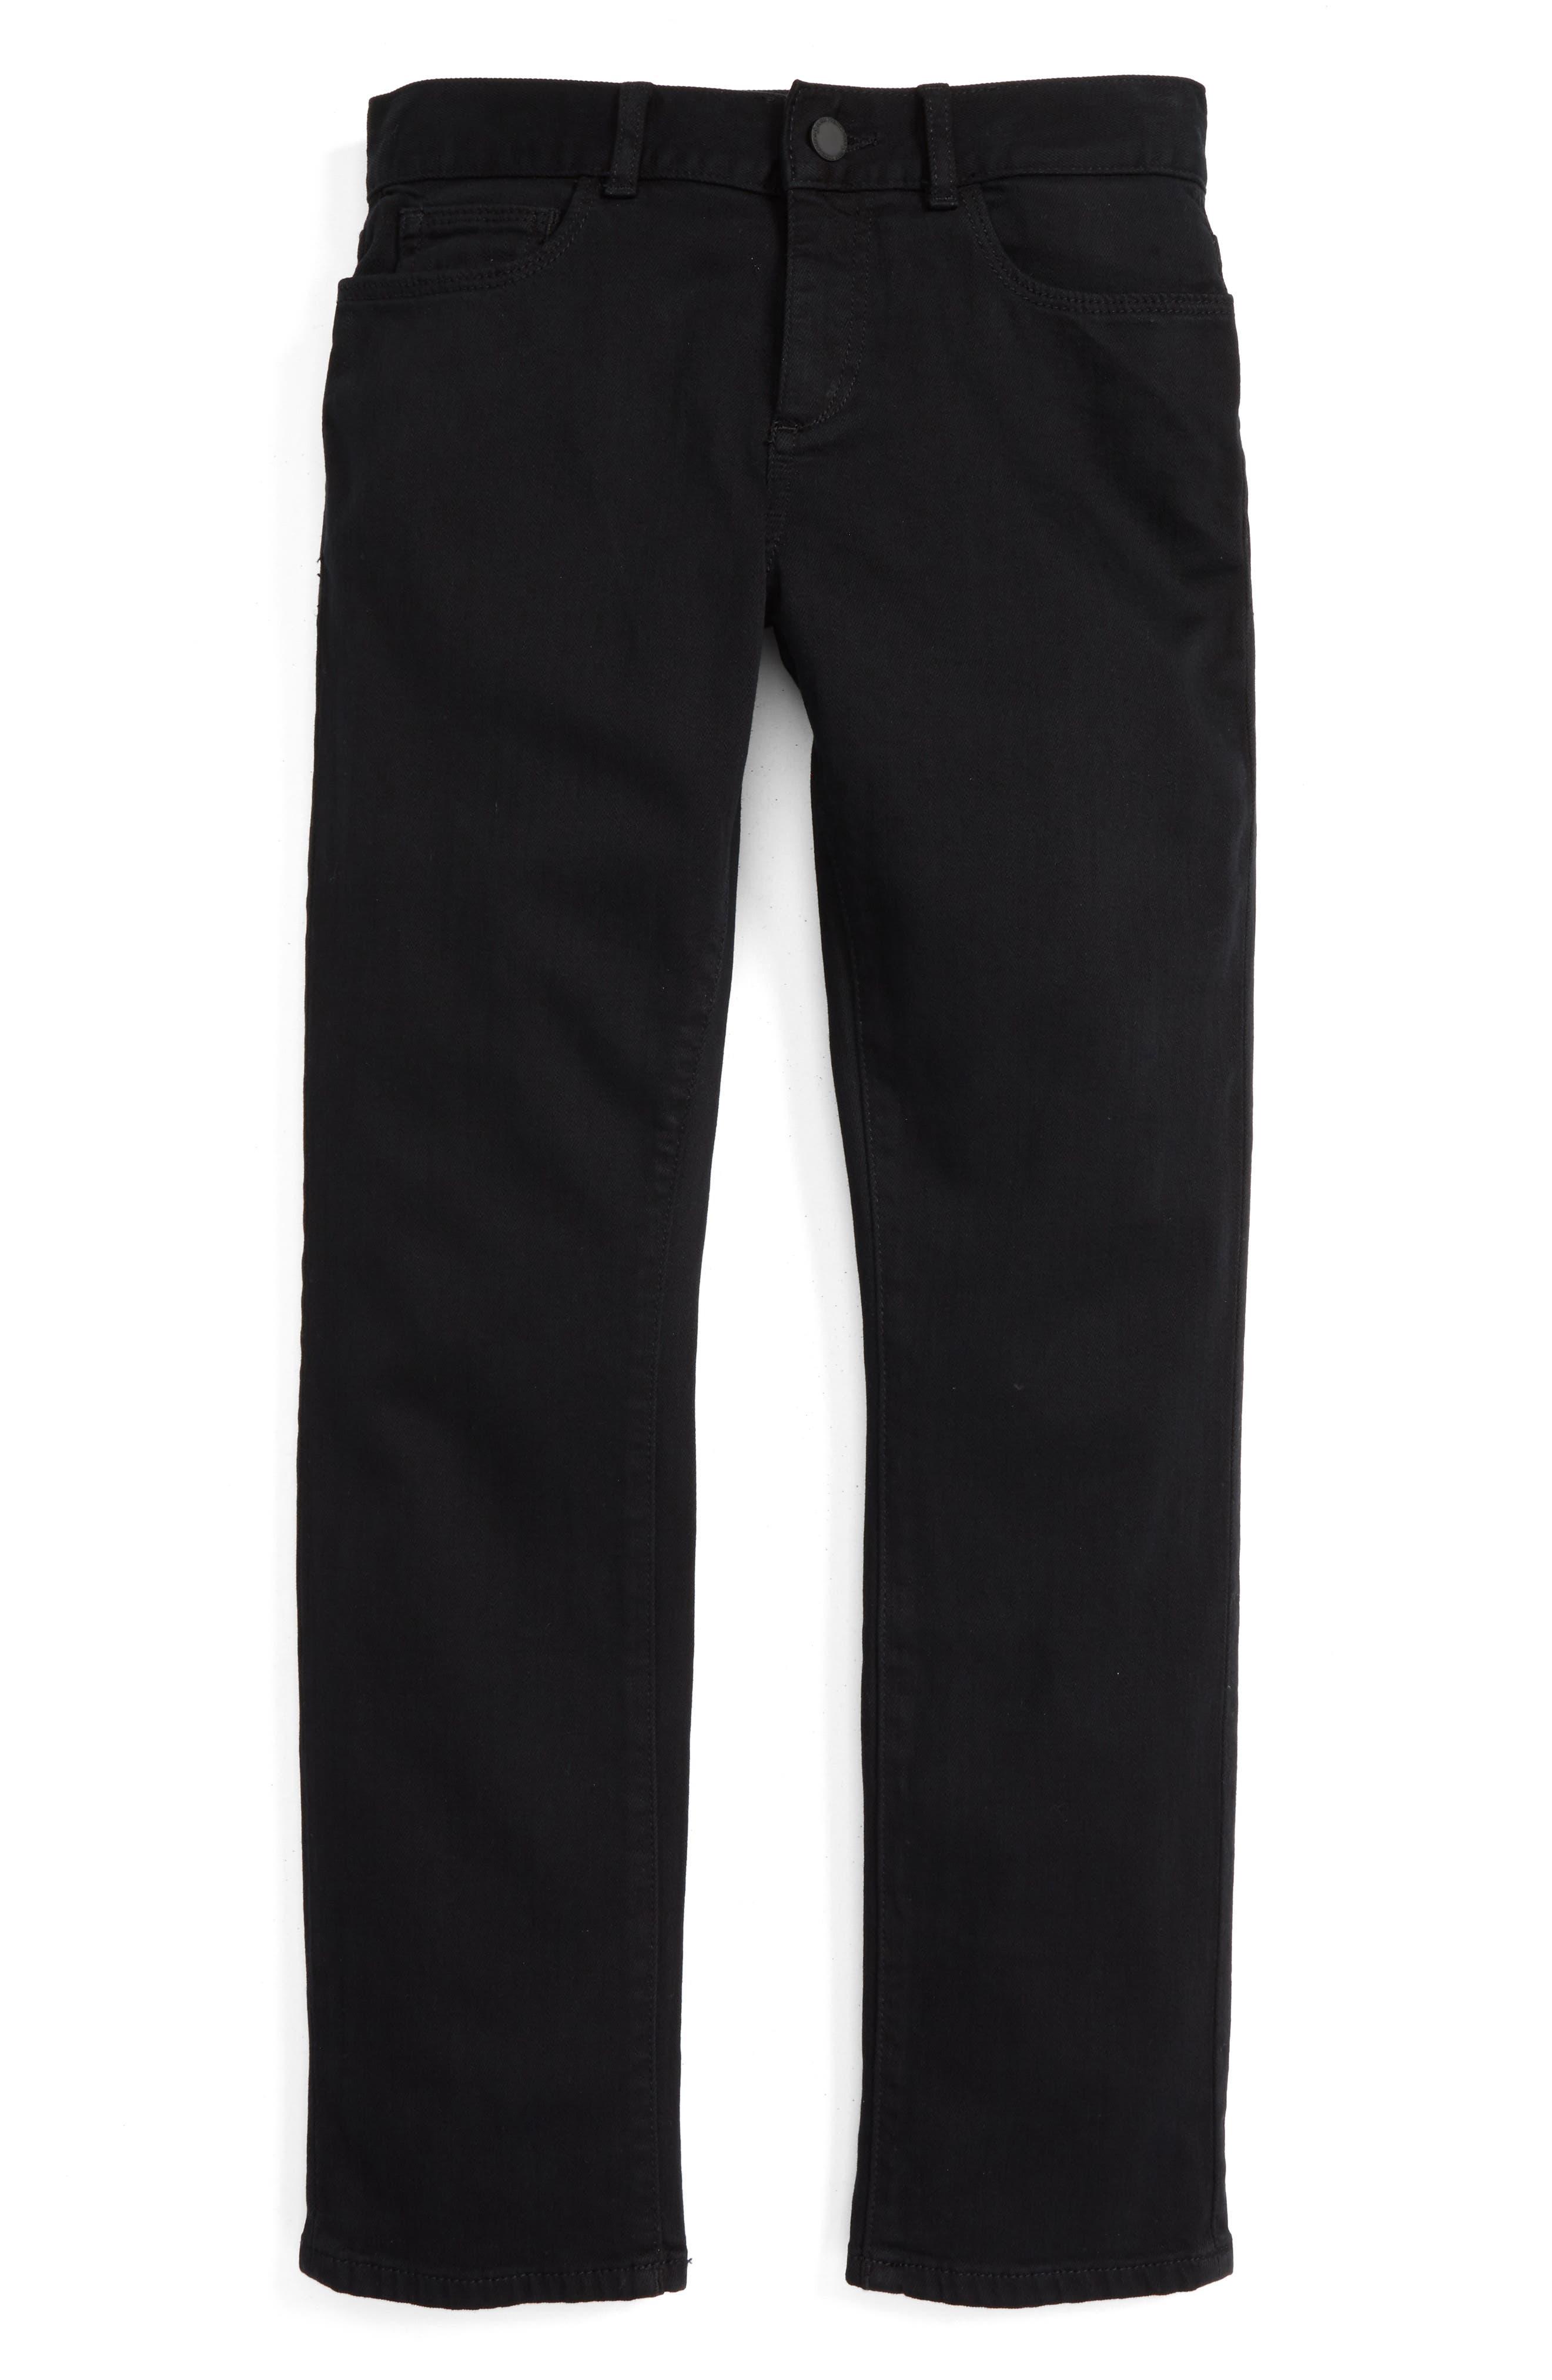 Brady Slim Fit Jeans,                             Alternate thumbnail 2, color,                             BLACK